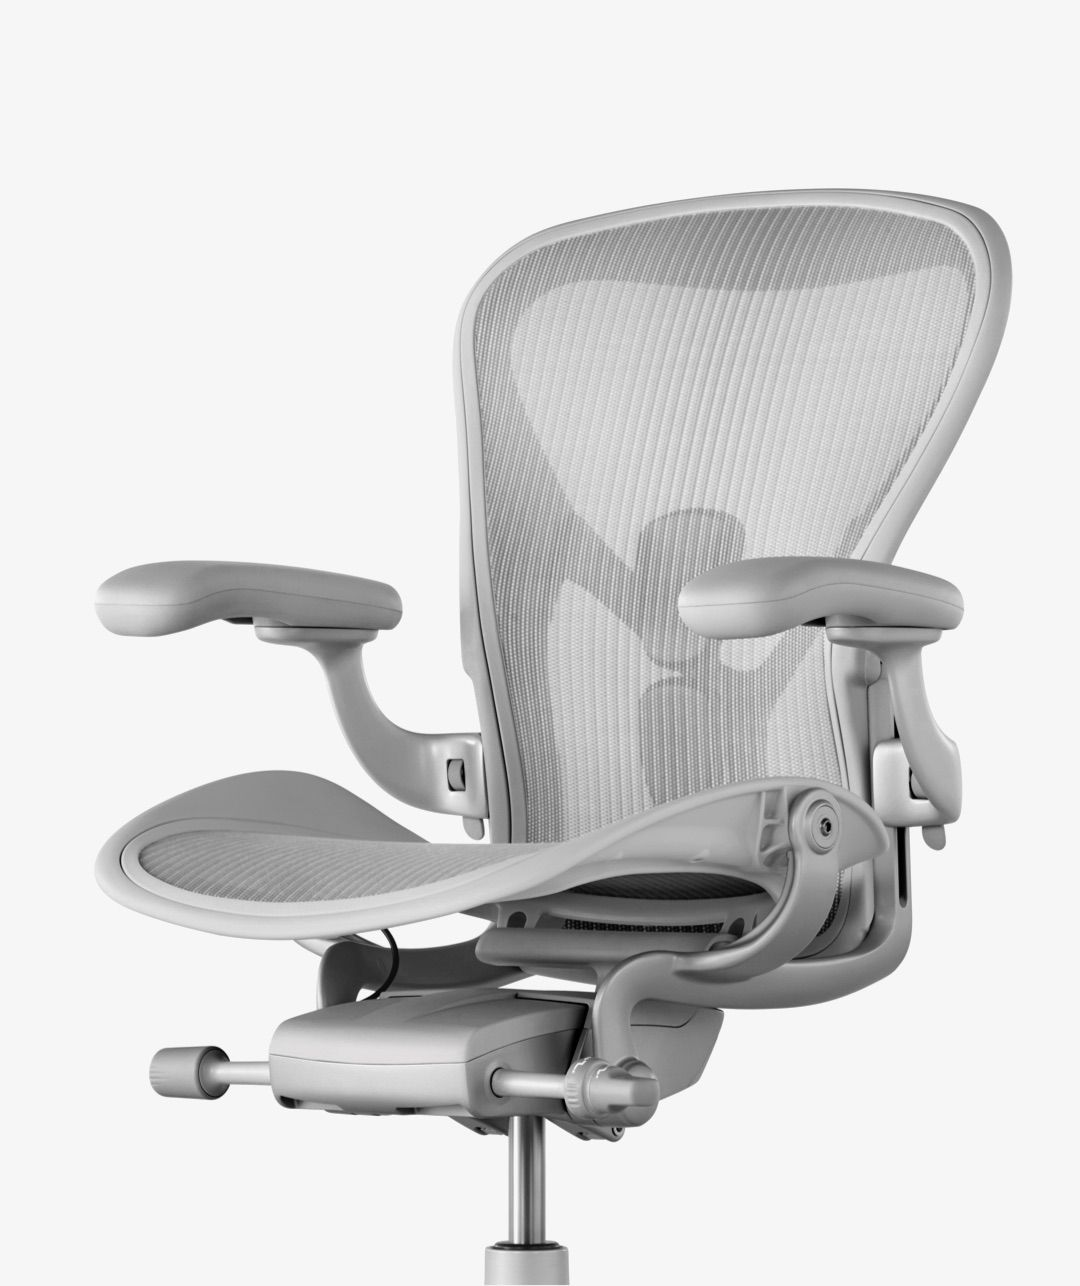 office chairs herman miller. Aeron Chairs - Herman Miller Office